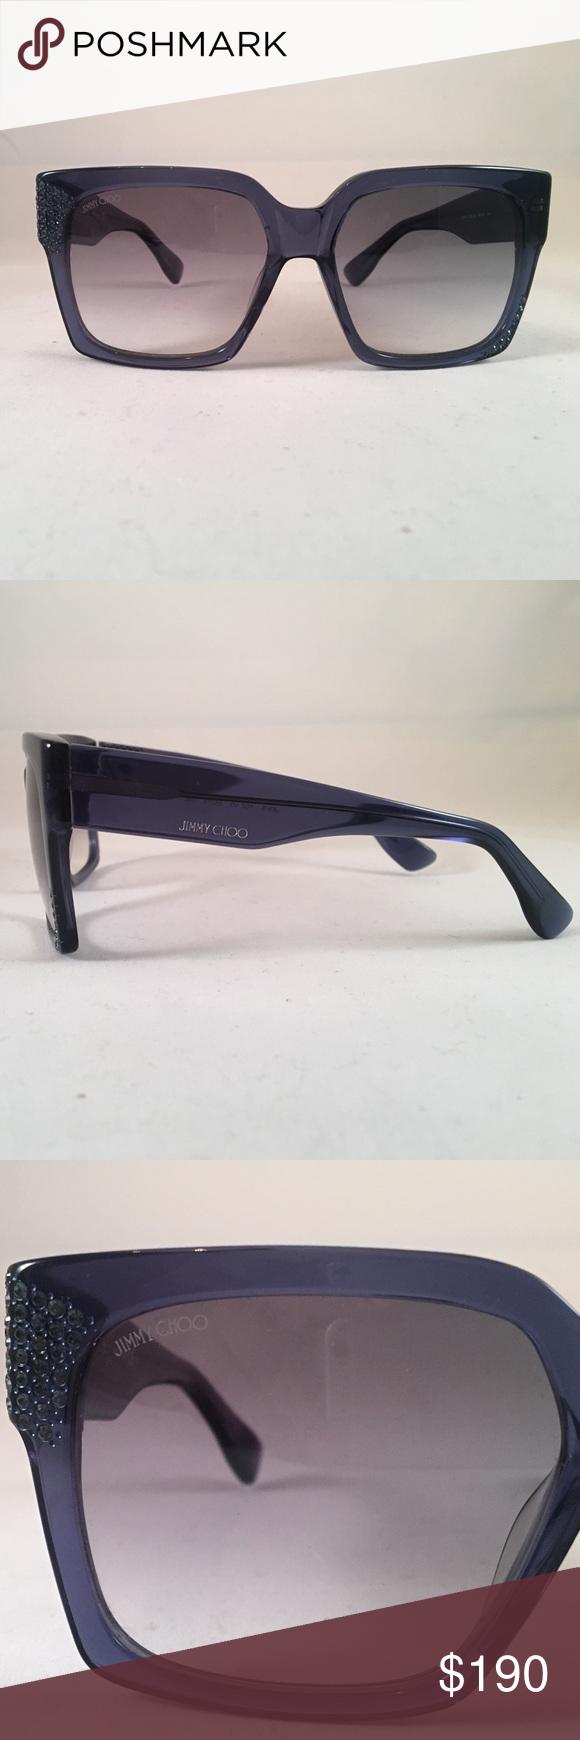 a5f533ca944 Jimmy choo Jen sunglasses Jimmy Choo sunglasses new but will not ship with  original case 100